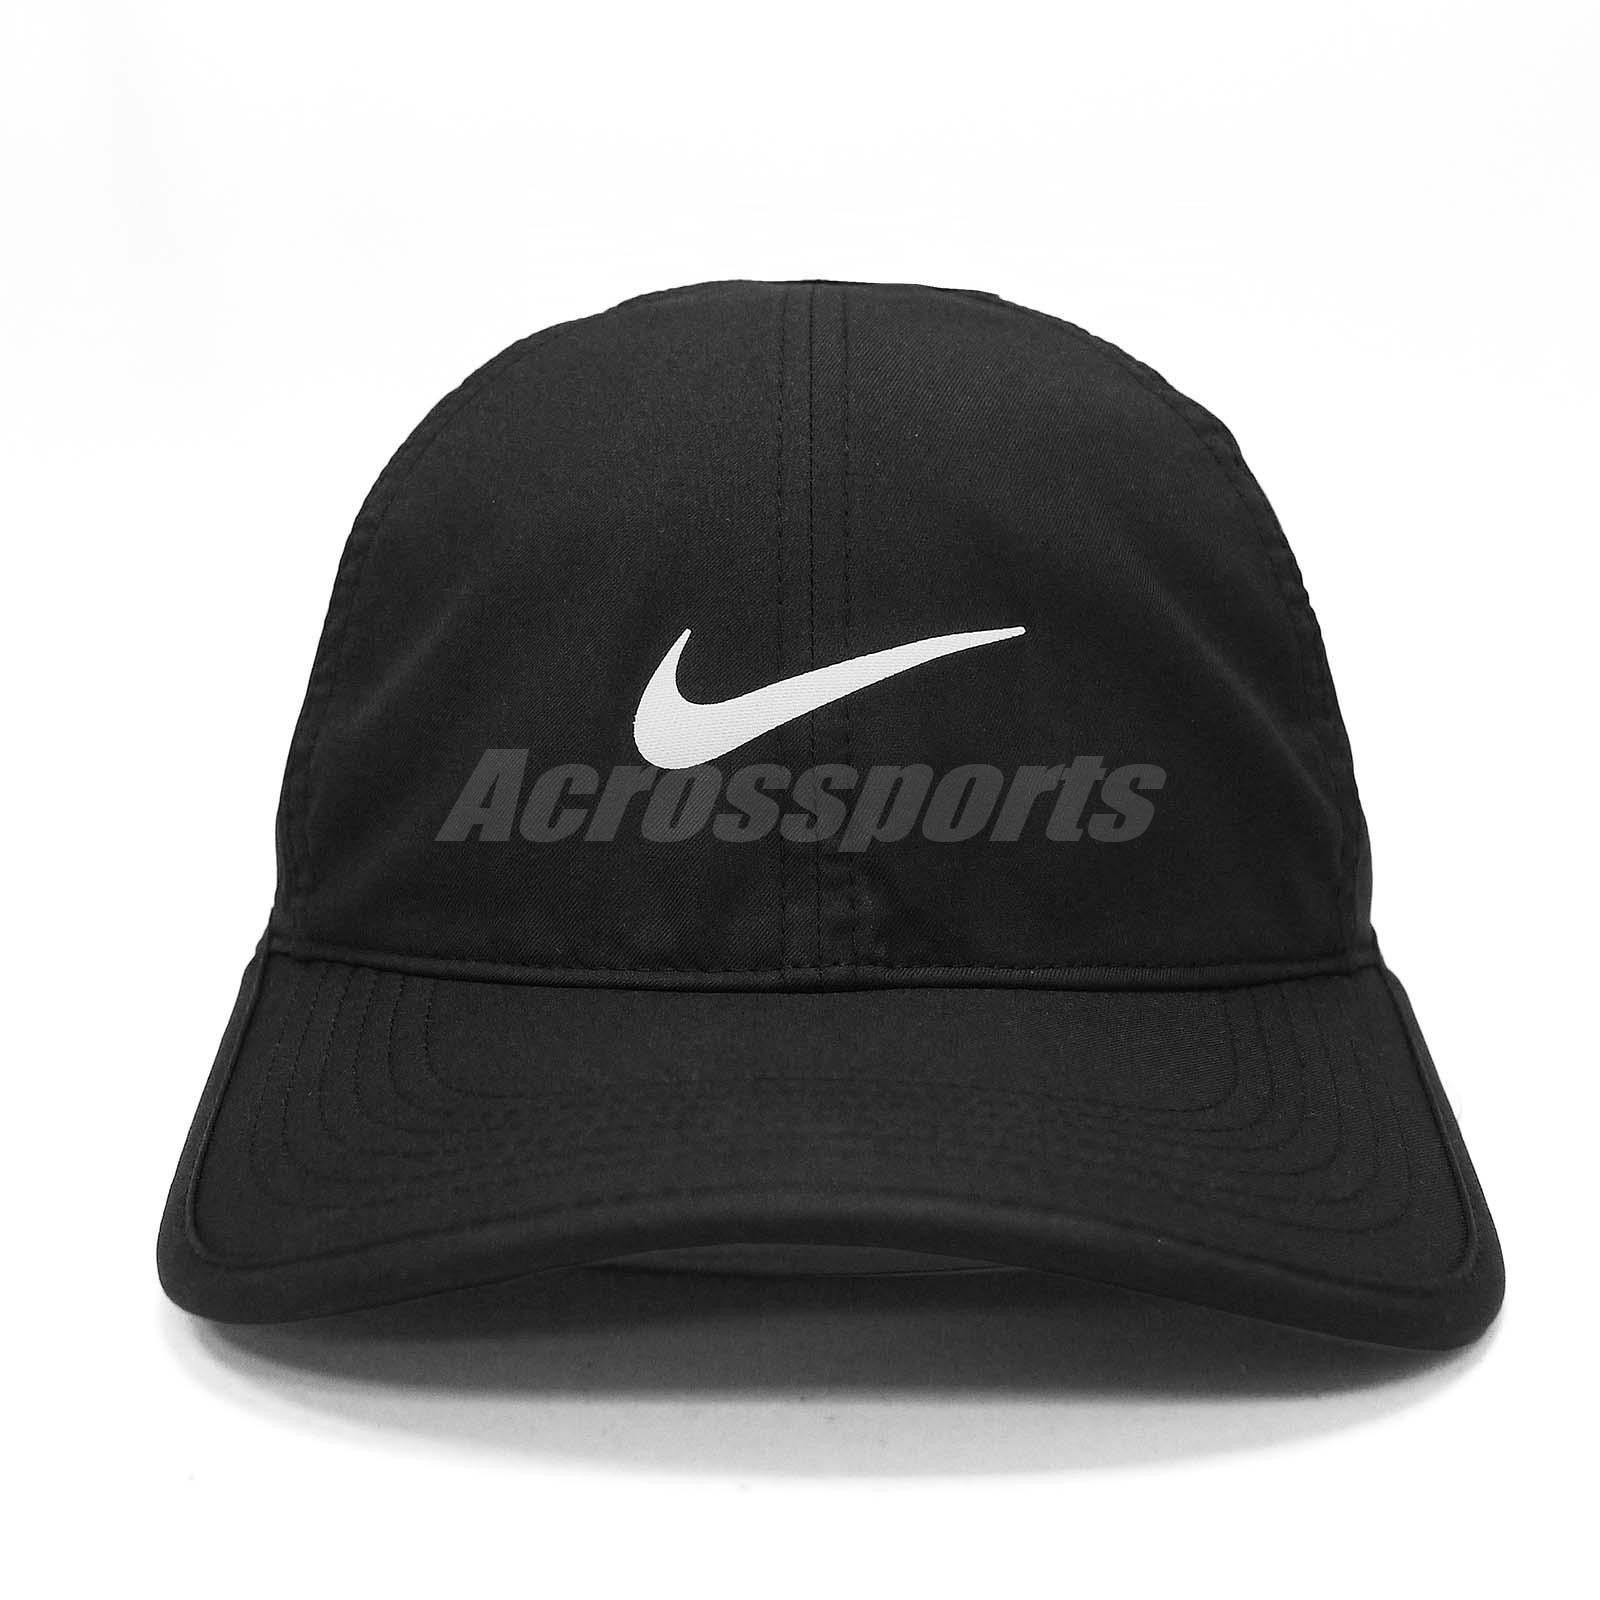 a1c7e07b08 Nike Aerobill Featherlight Dri-FIT Black White Unisex Tennis Cap Hat ...